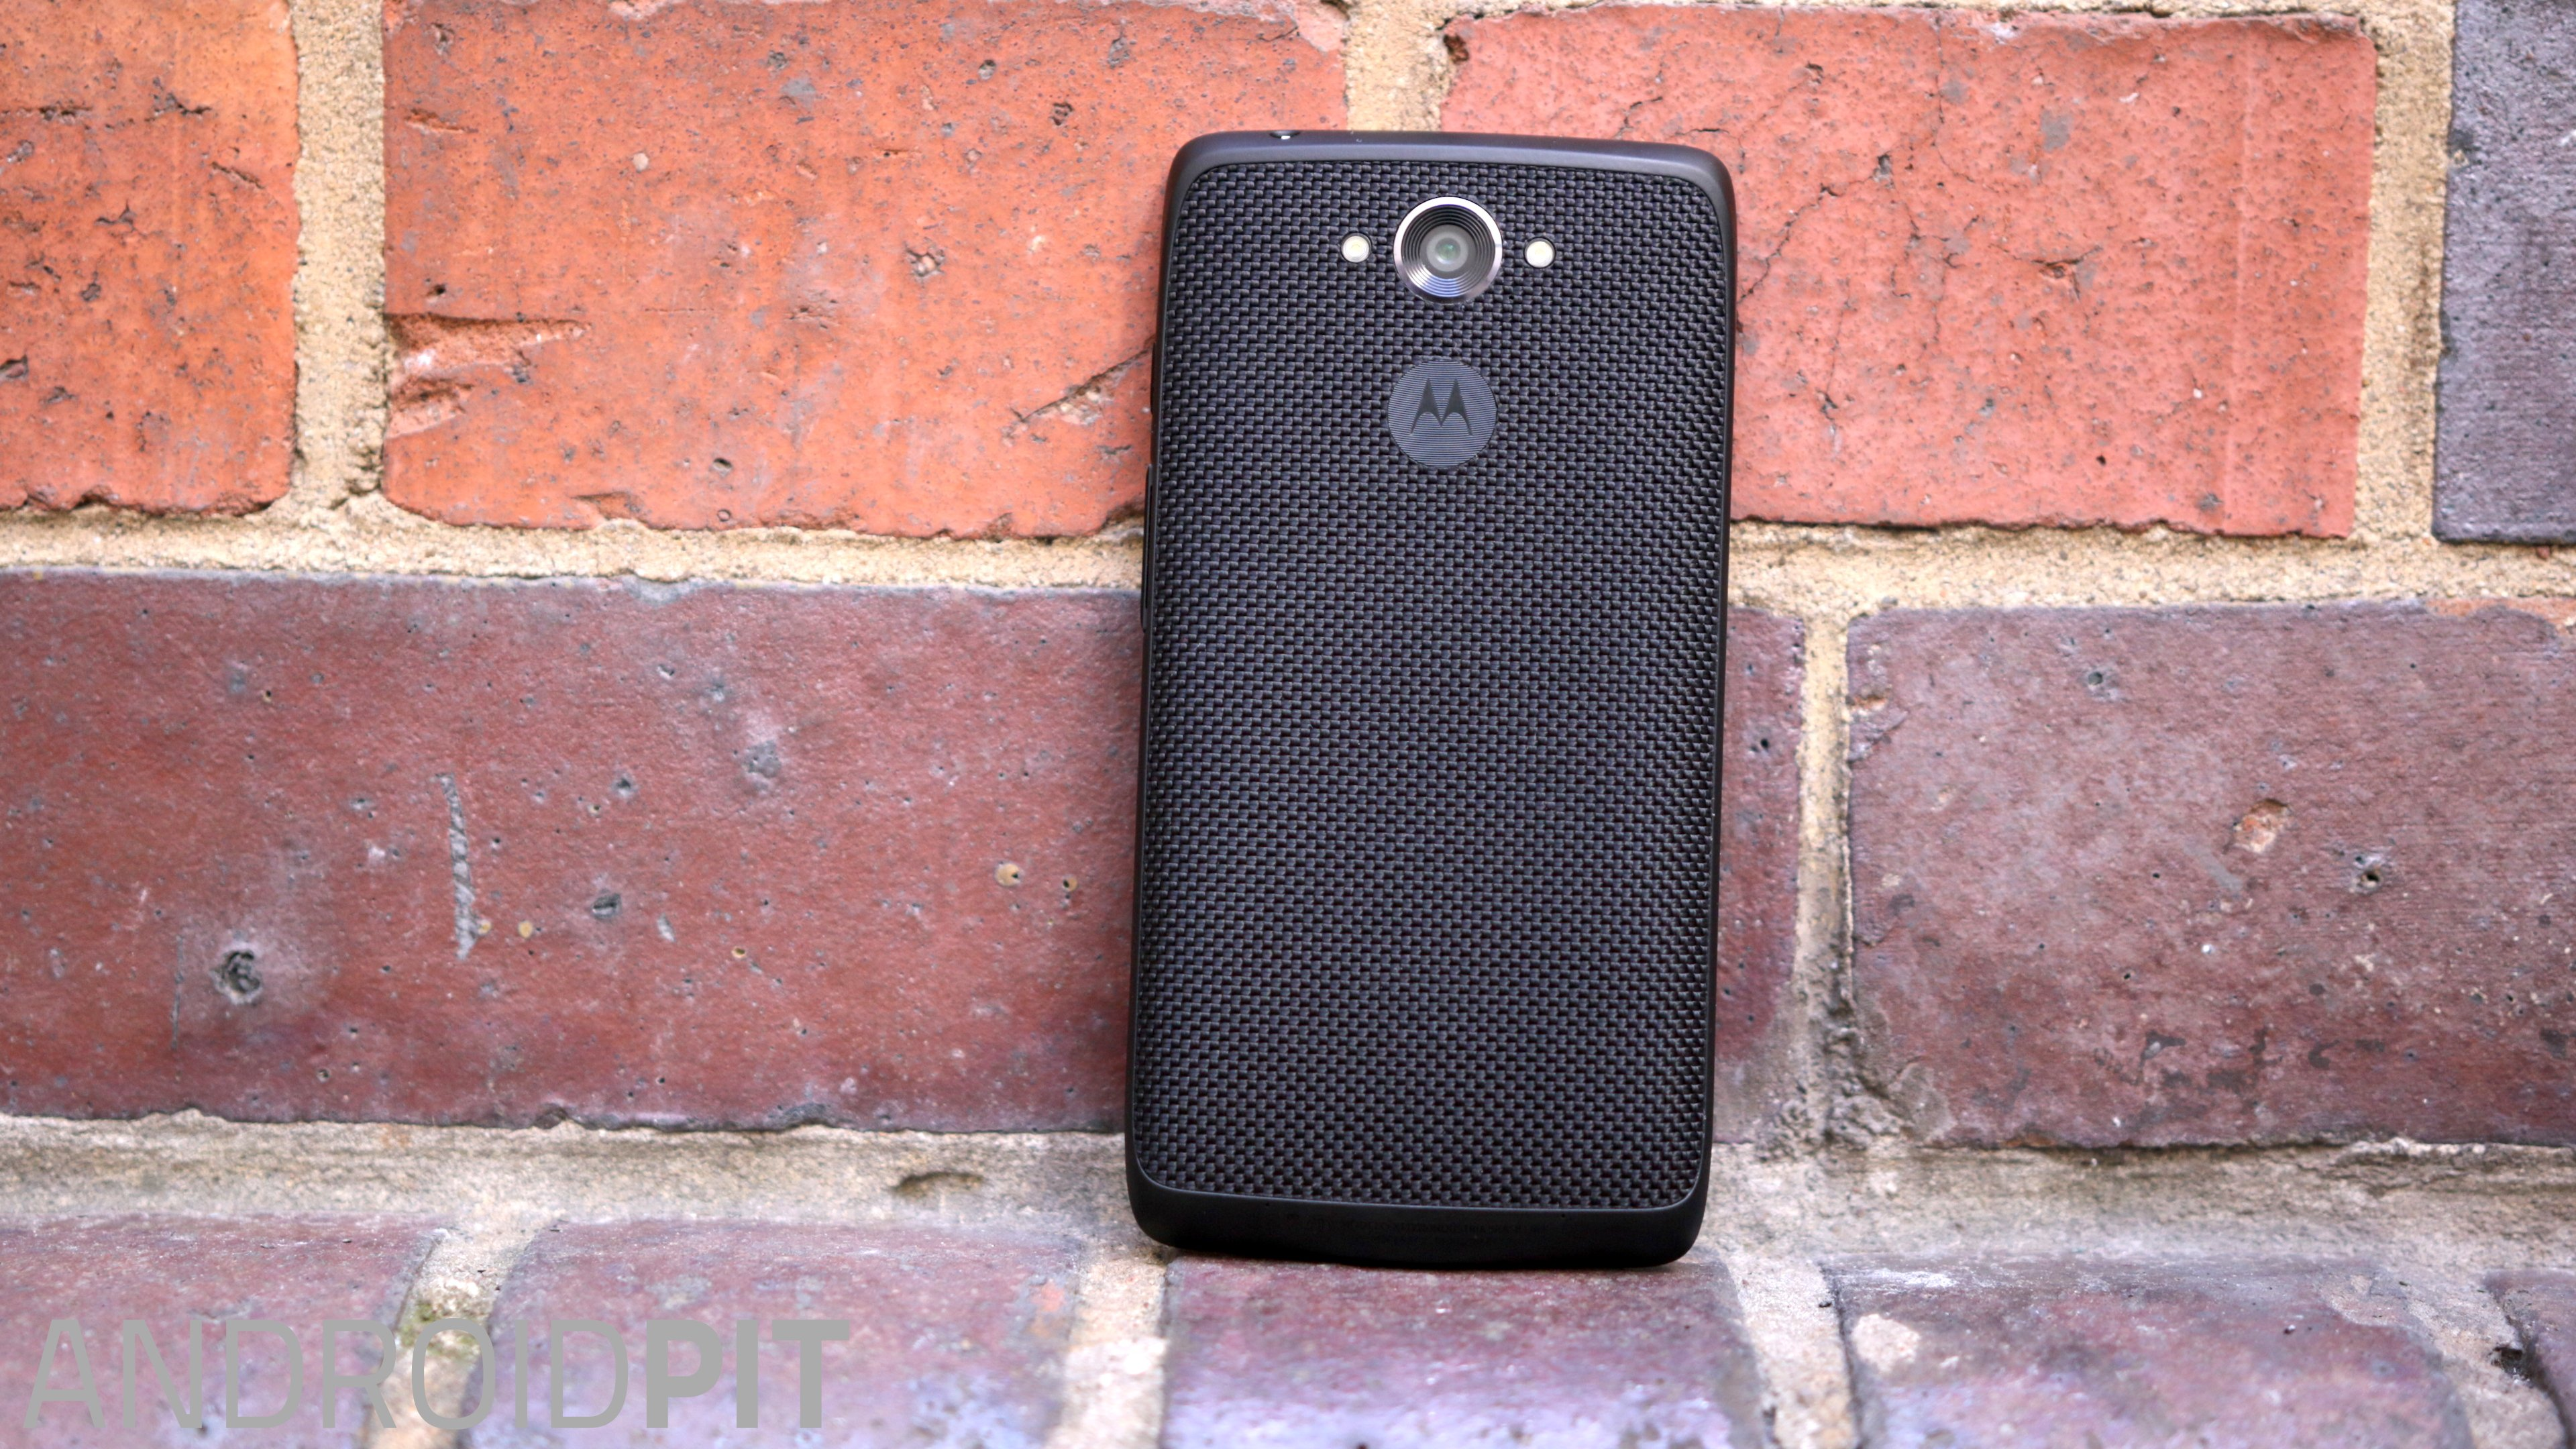 Moto Maxx começa a receber o Android 6.0.1 Marshmallow no Brasil | AndroidPIT